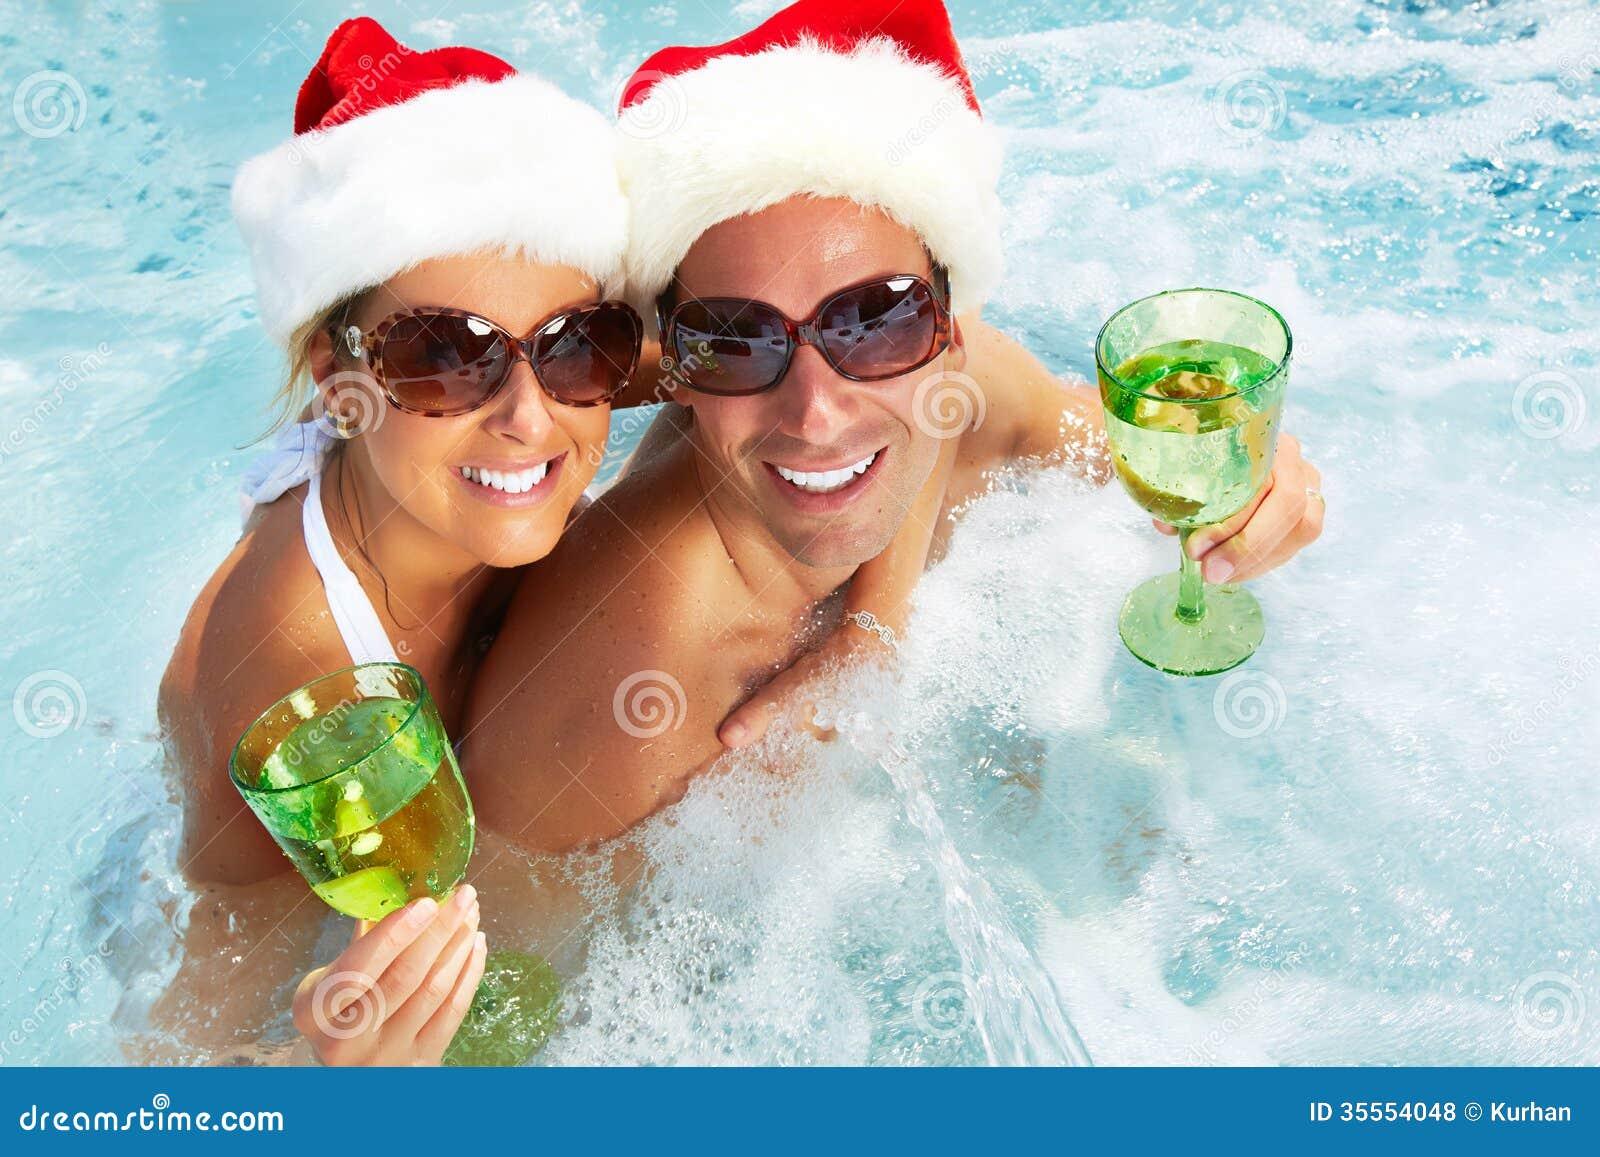 Happy Christmas Santa Couple In Jacuzzi Royalty Free Stock Photos Image 35554048